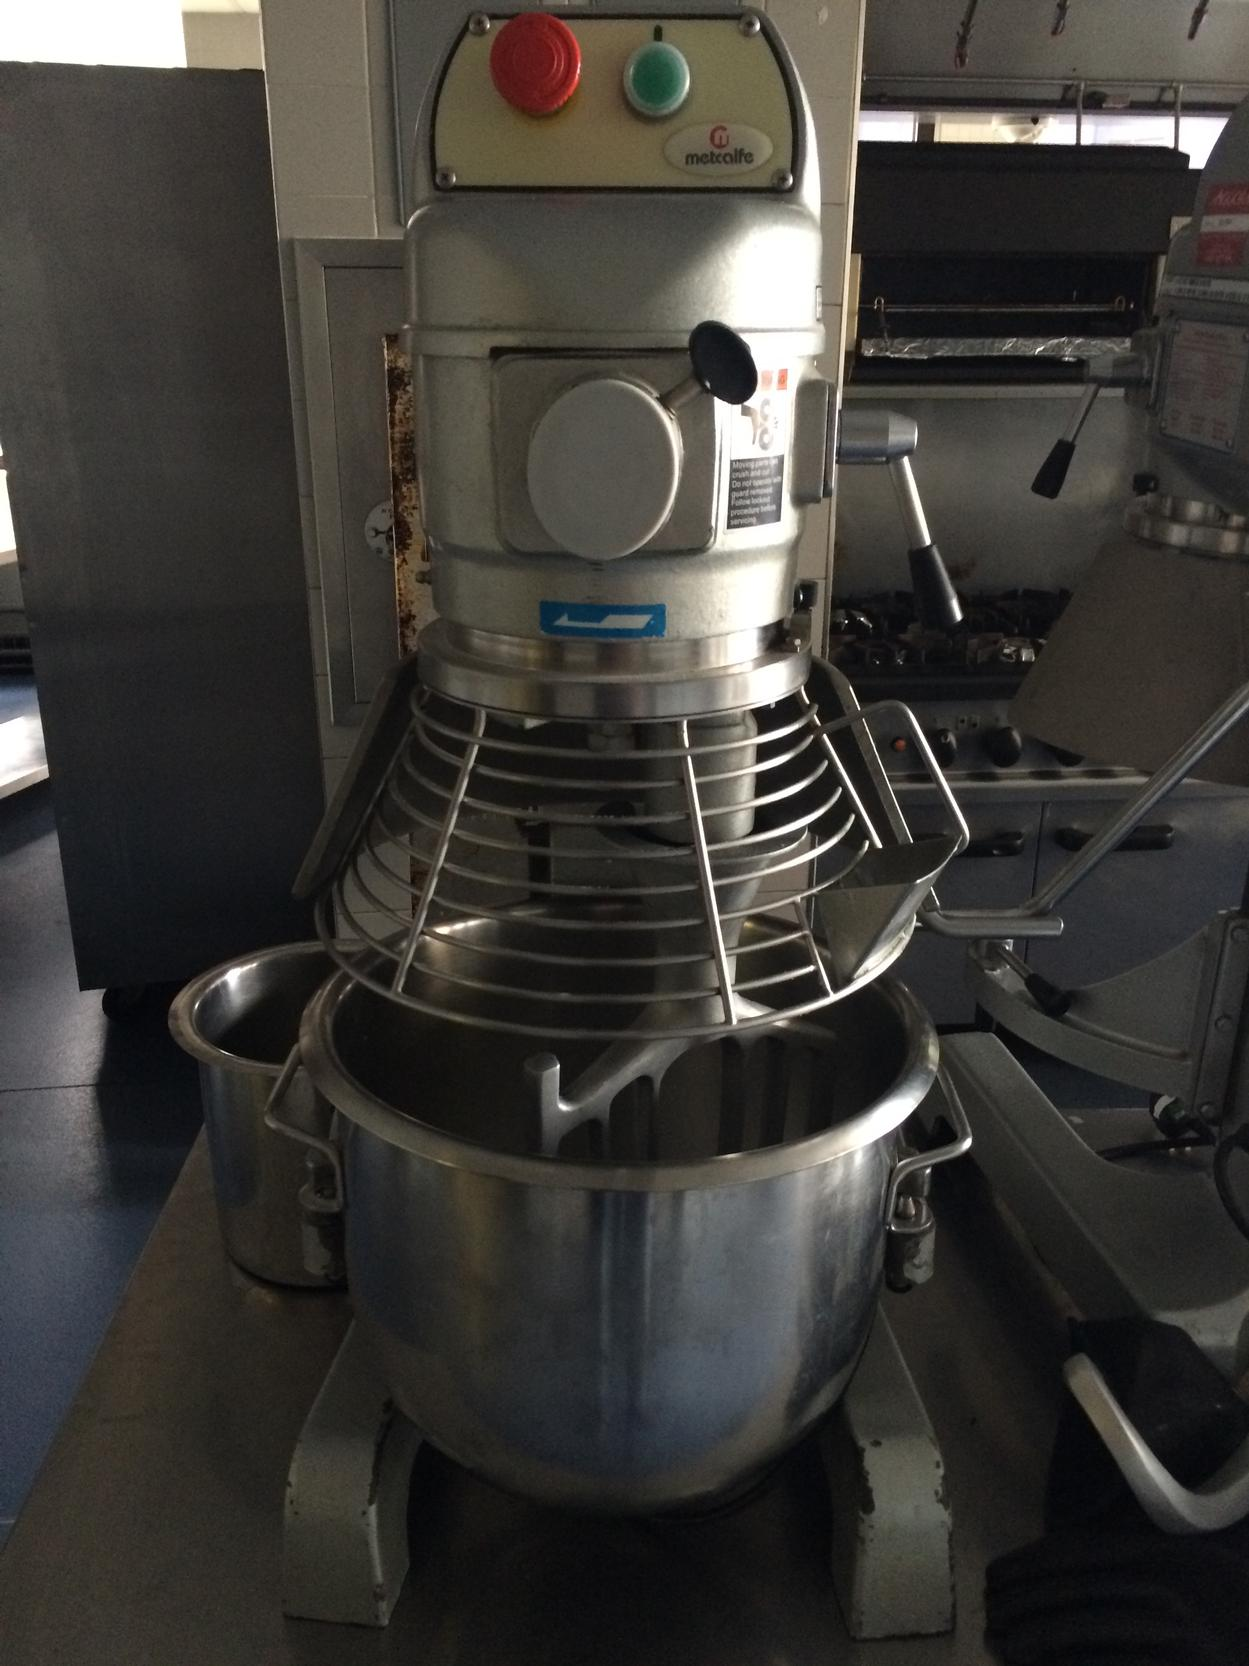 Metcalfe 20q planetary mixer